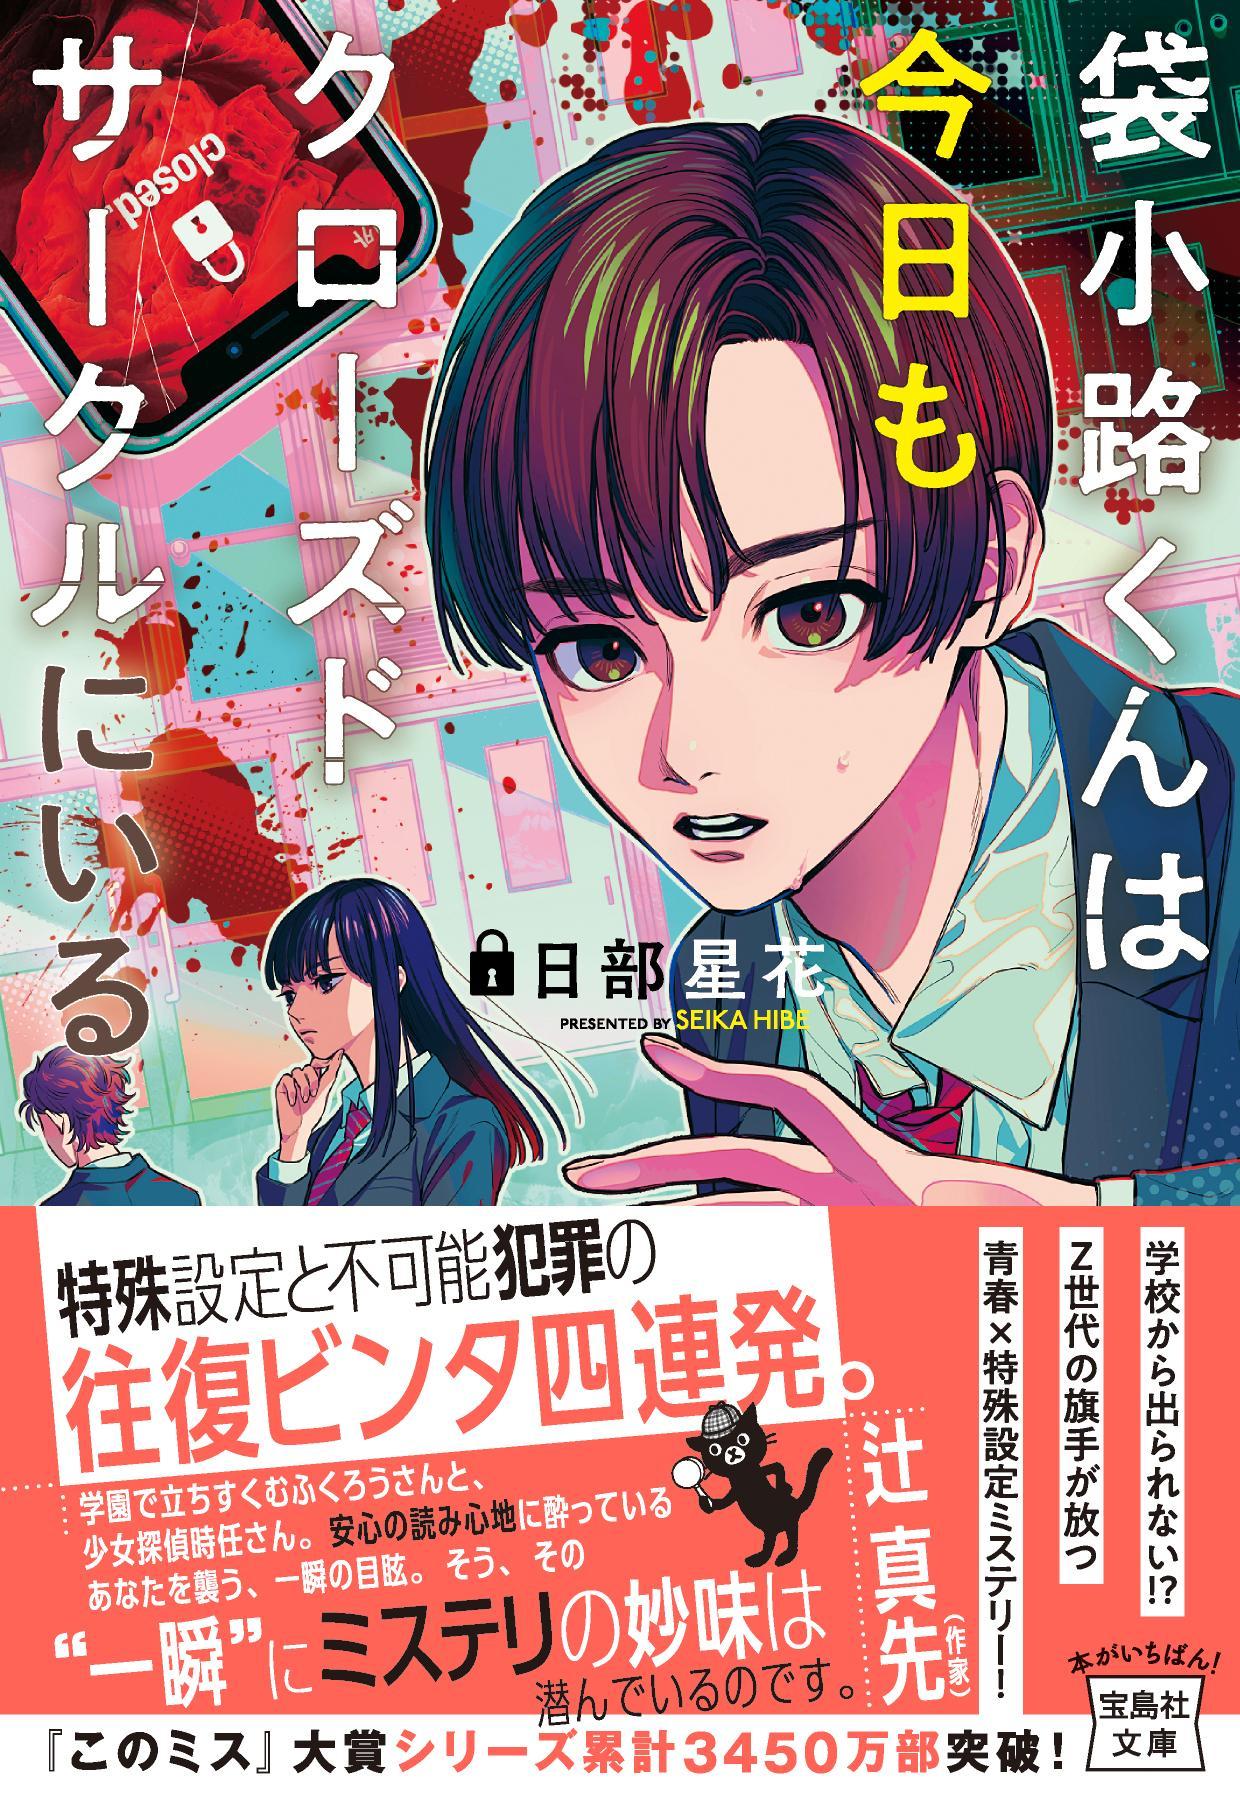 1628050101130_fukurokojikun_cover_obi_re.jpg